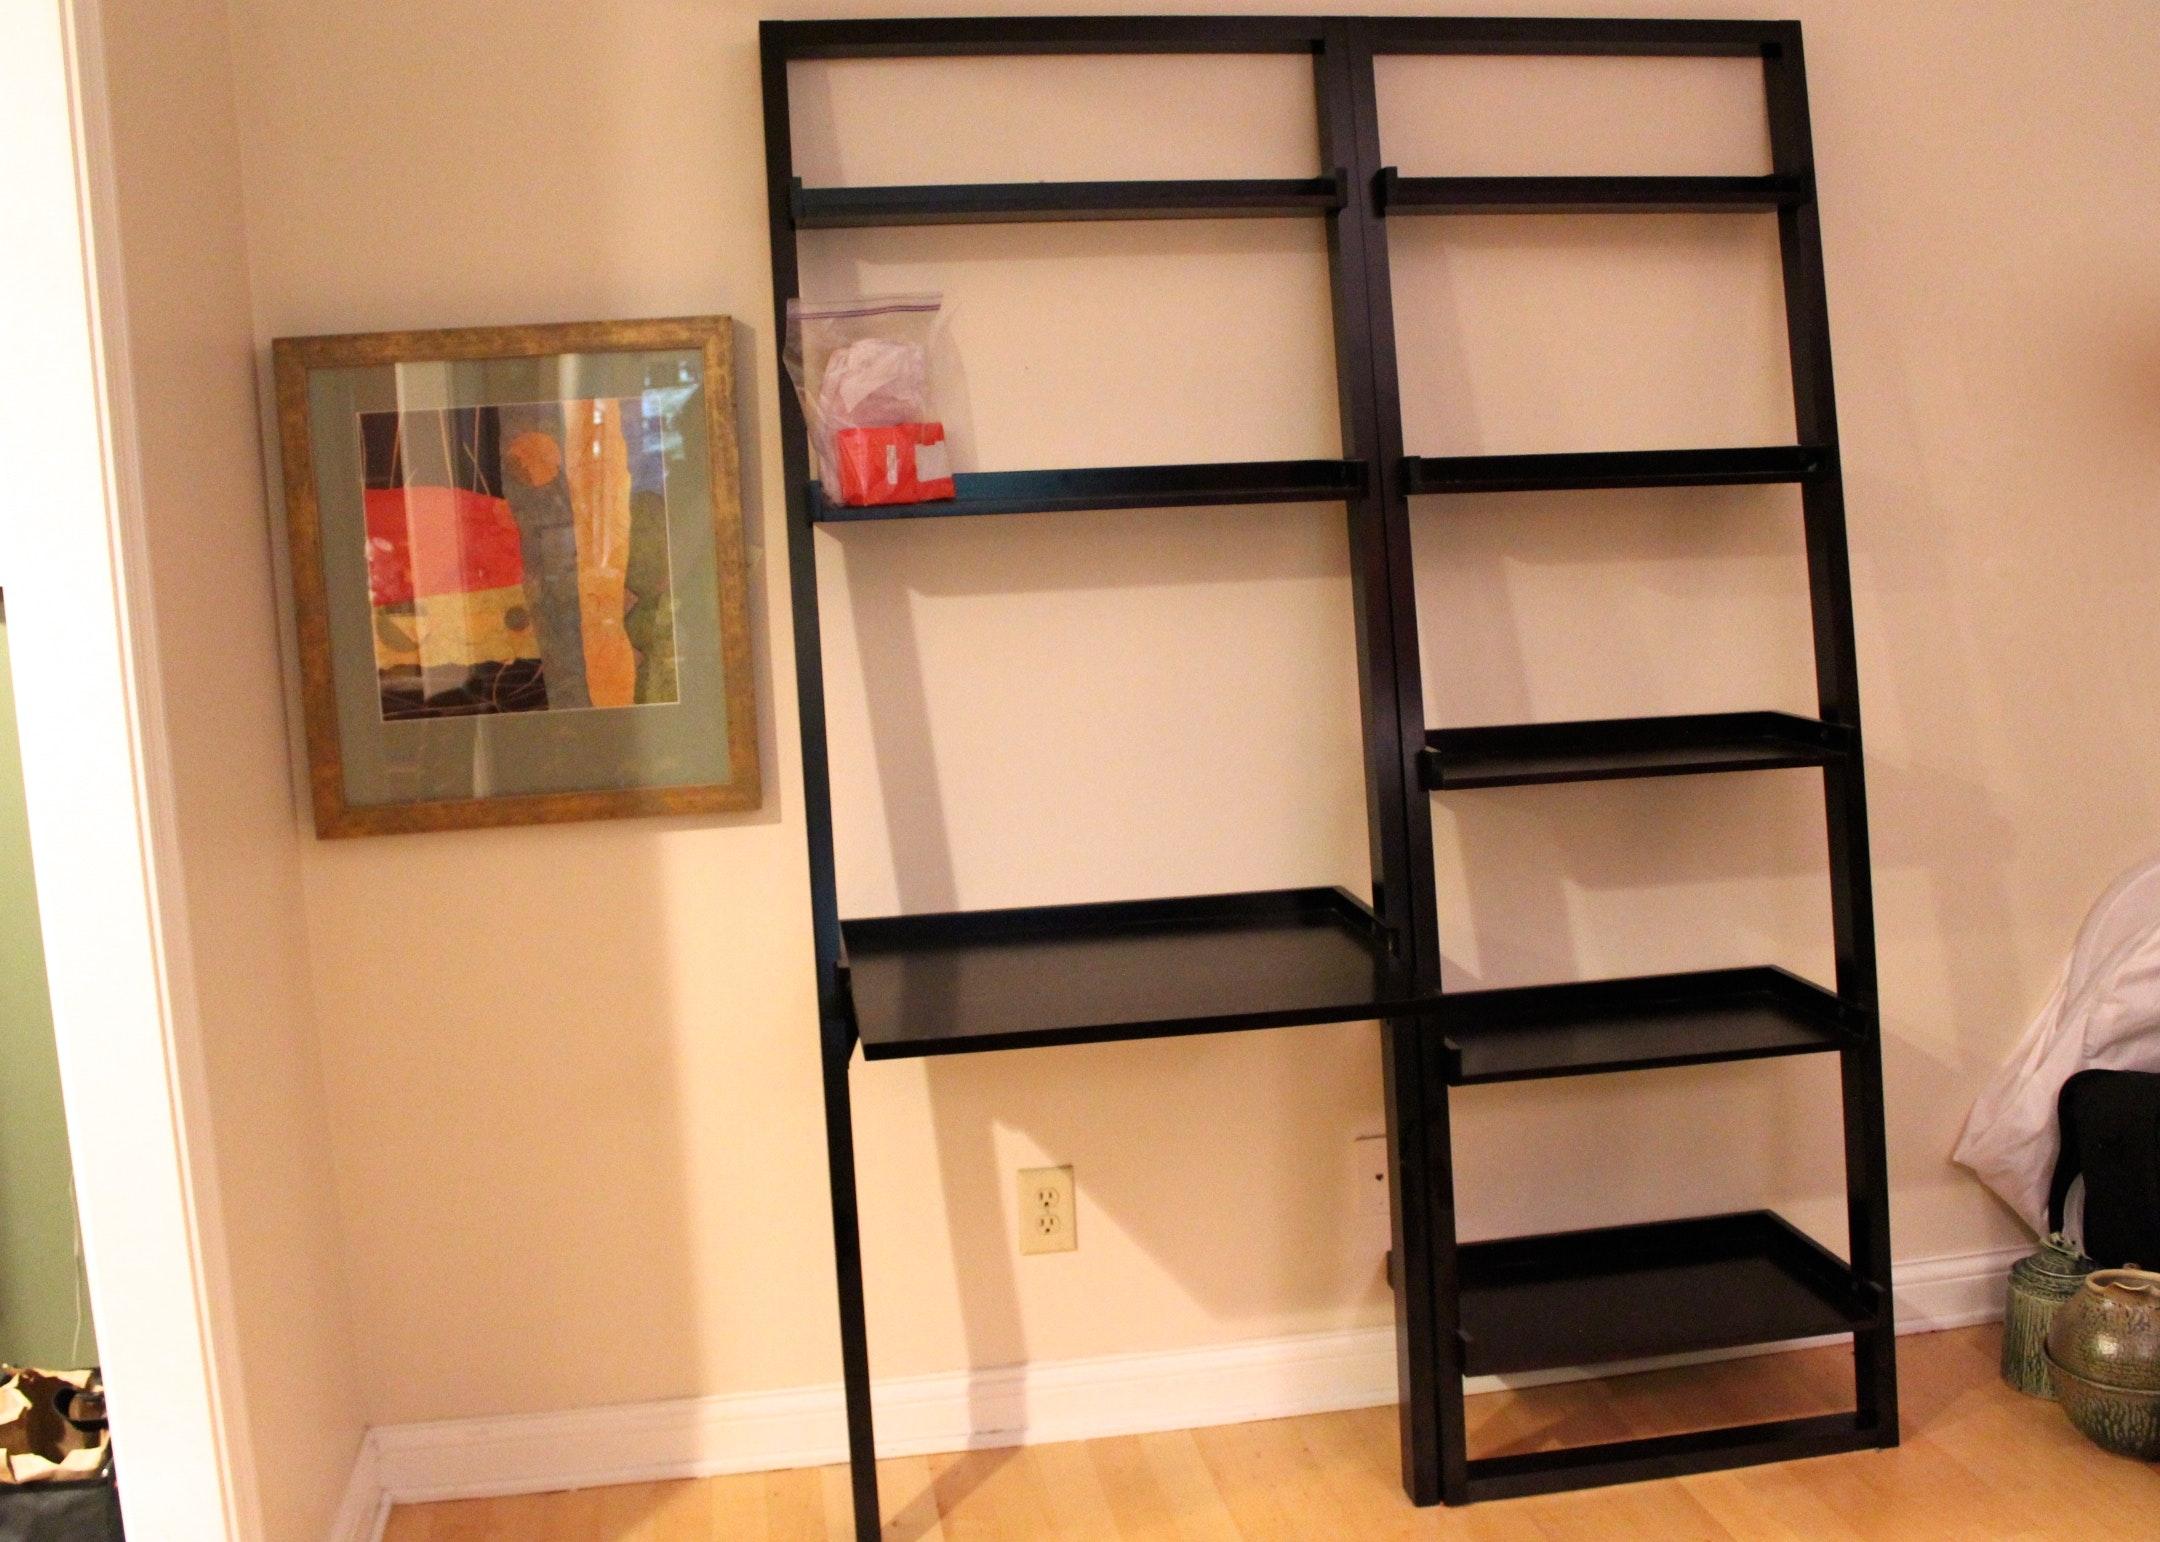 Crate Amp Barrel Sloane Leaning Desk And Bookshelf Ebth